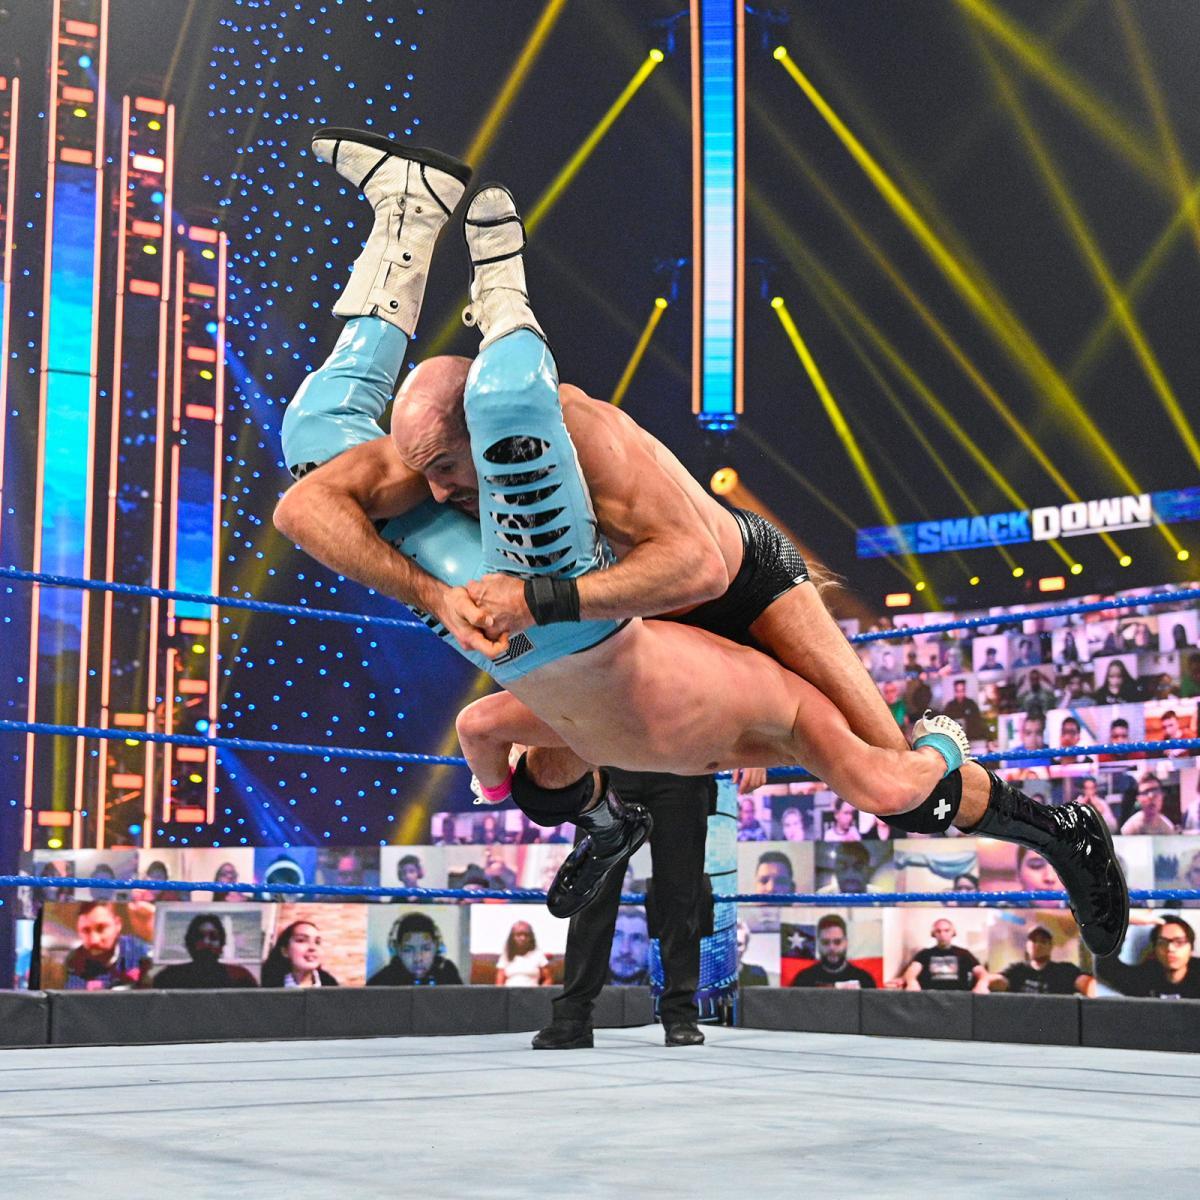 Cesaro gets the win over Dolph Ziggler... #Smackdown 👊👏👏👏👏👏👌👍🤙